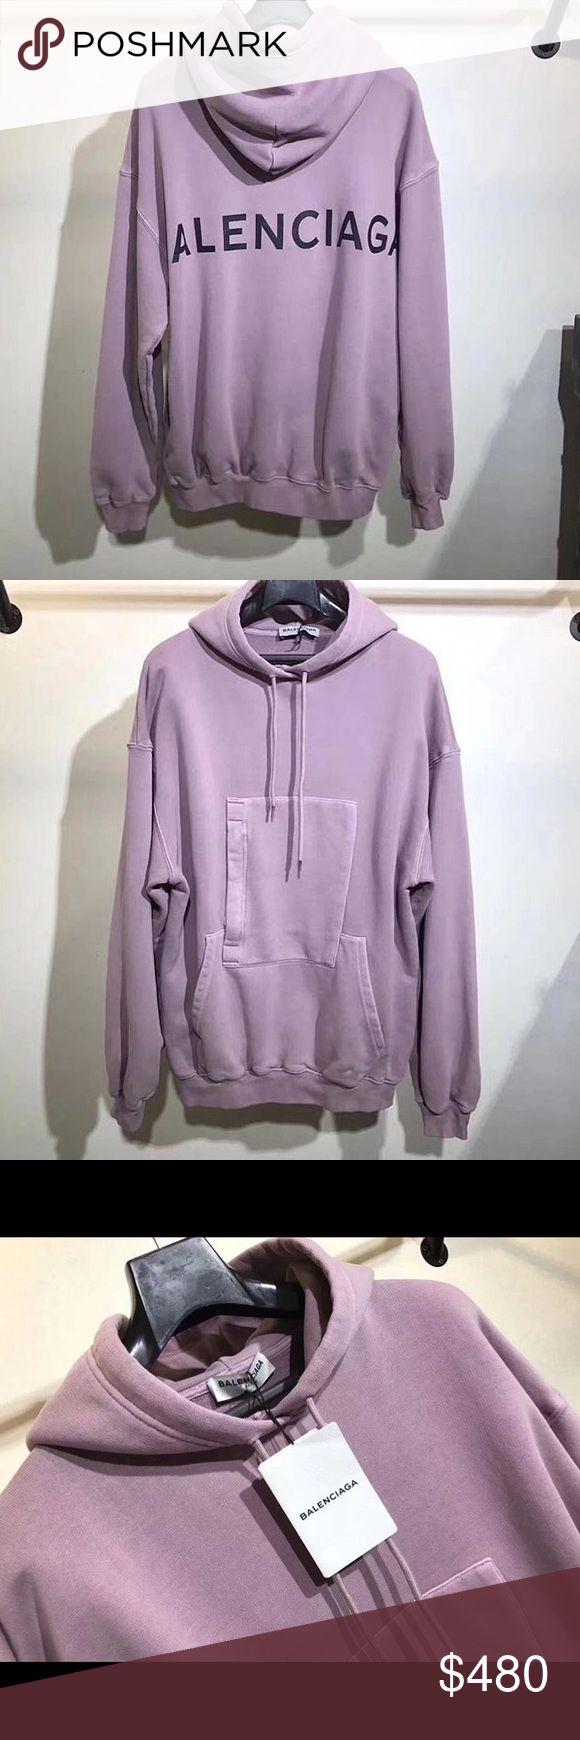 balenciaga hoodie price